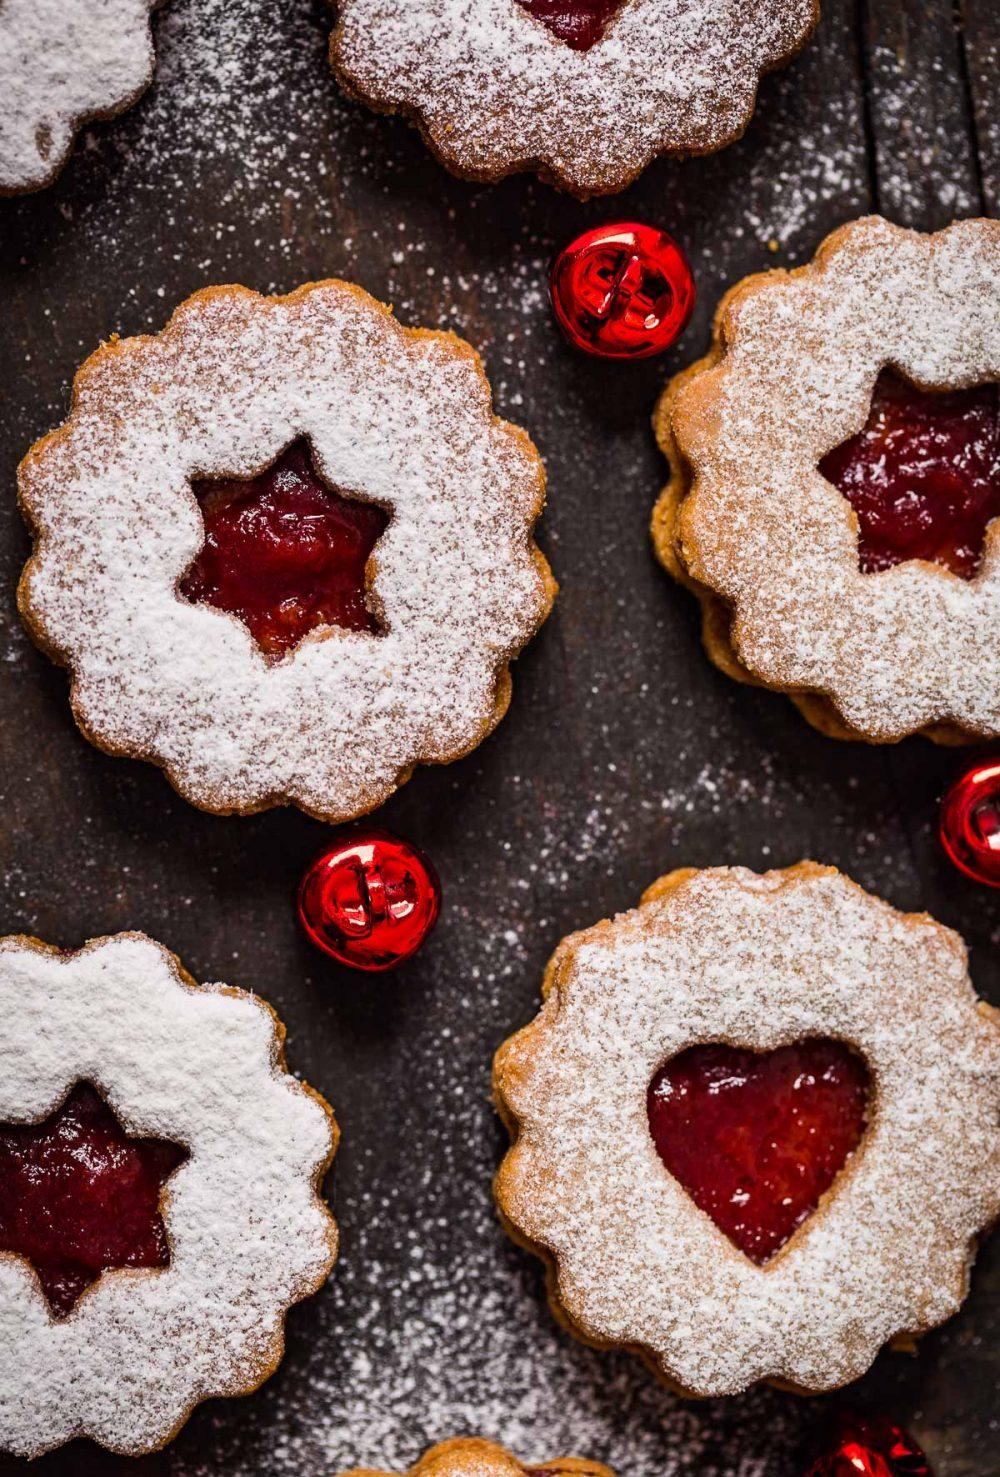 ricetta originale BISCOTTI LINZER VEGANI senza burro senza uova biscotti di Natale vegan VEGAN LINZER COOKIES original recipe Christmas cookies